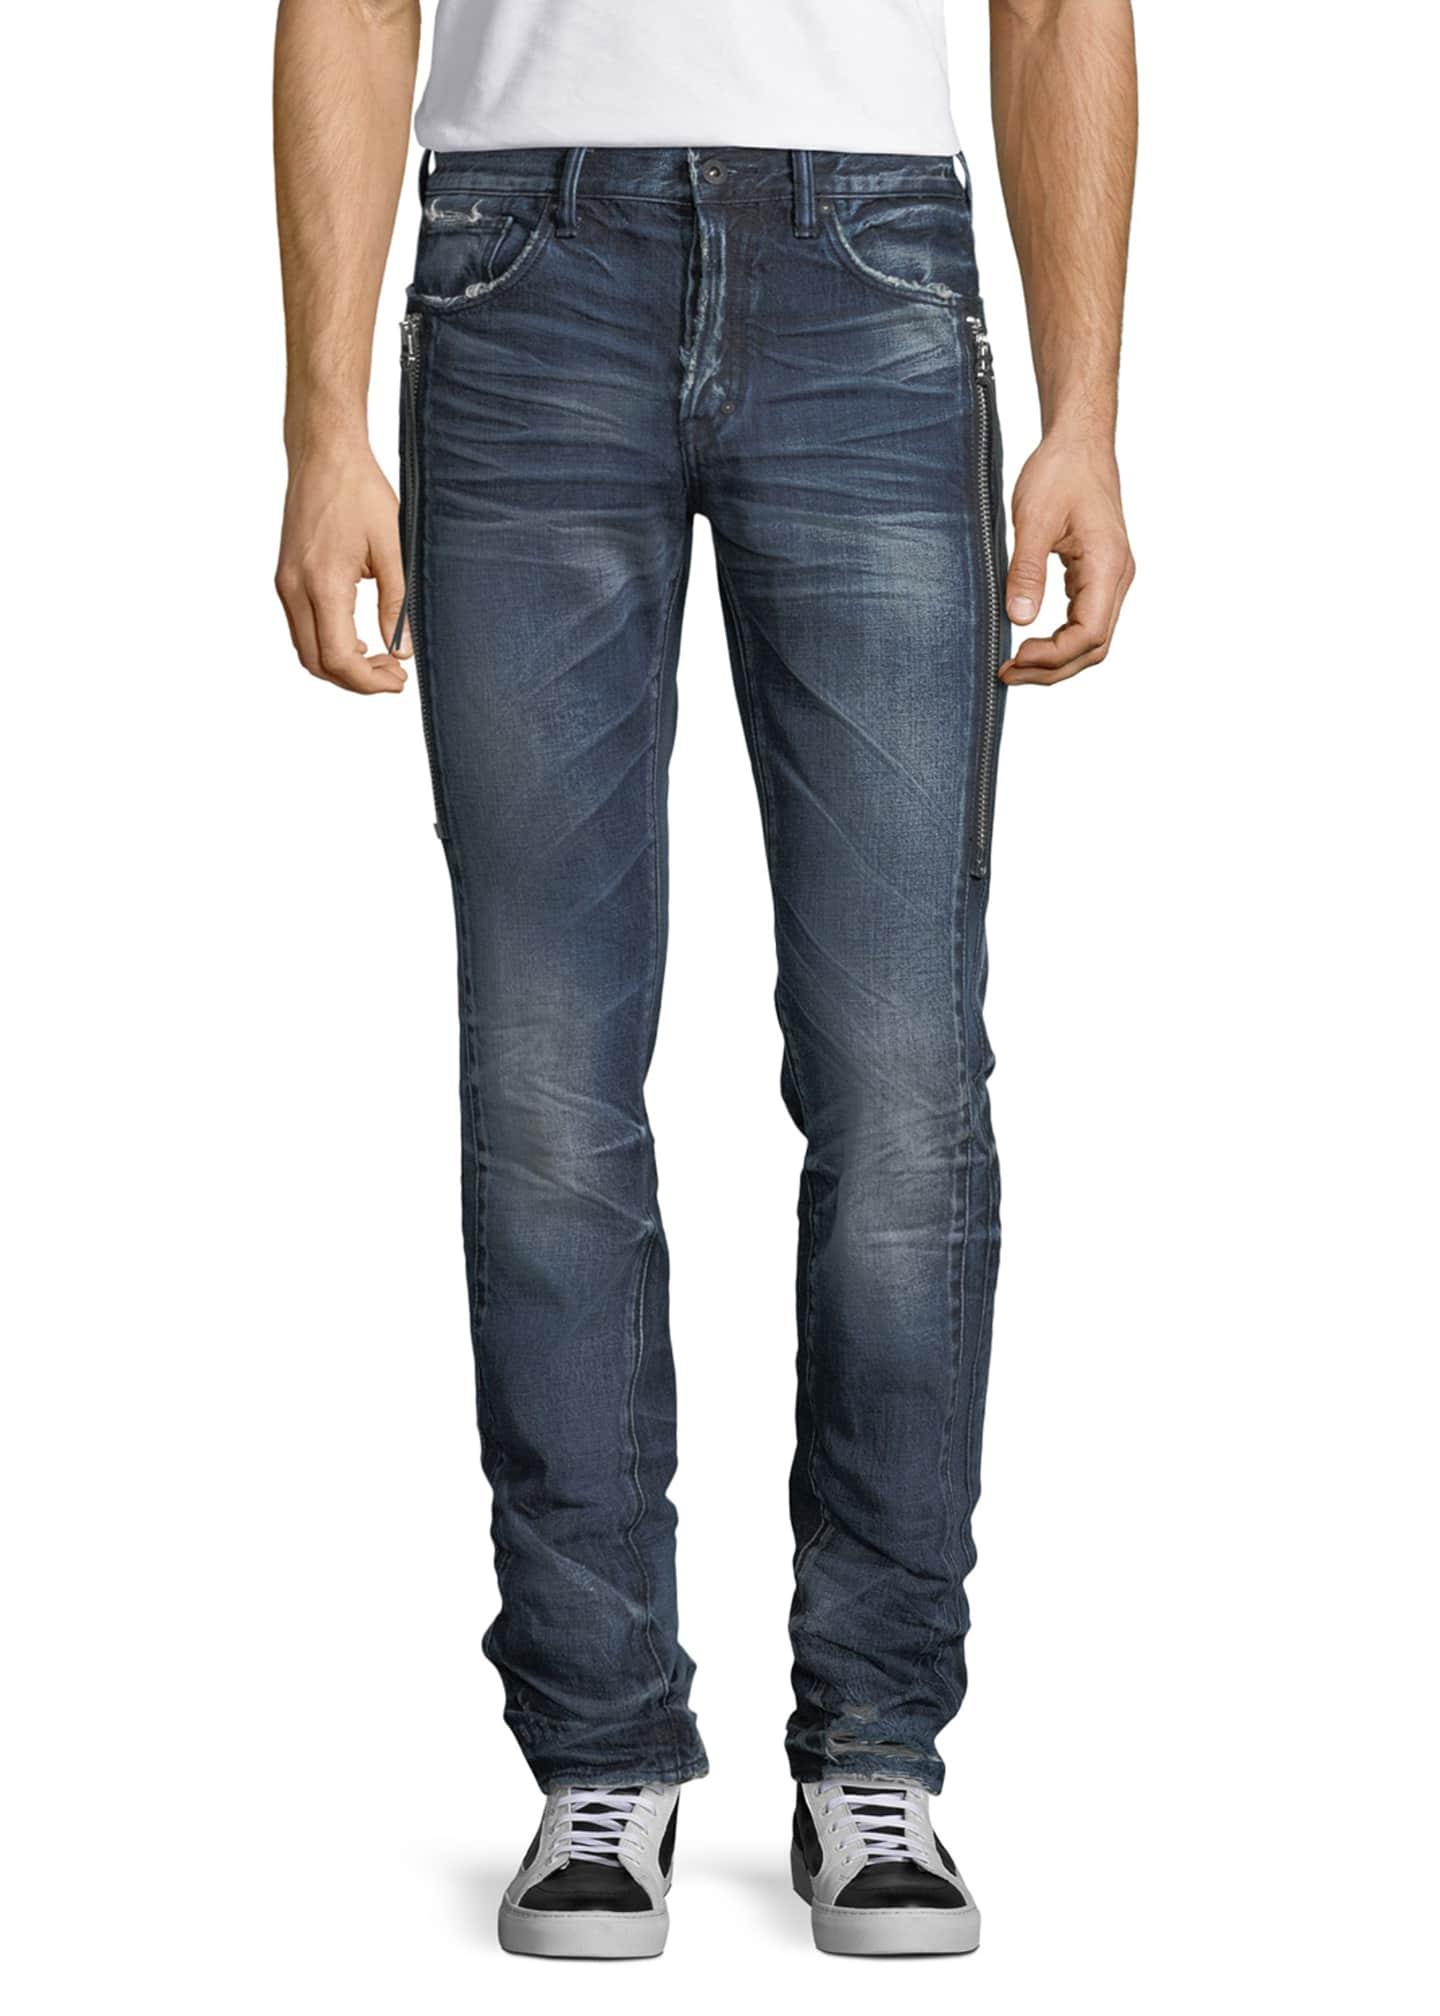 PRPS Le Sabre Side-Zip Tapered Jeans